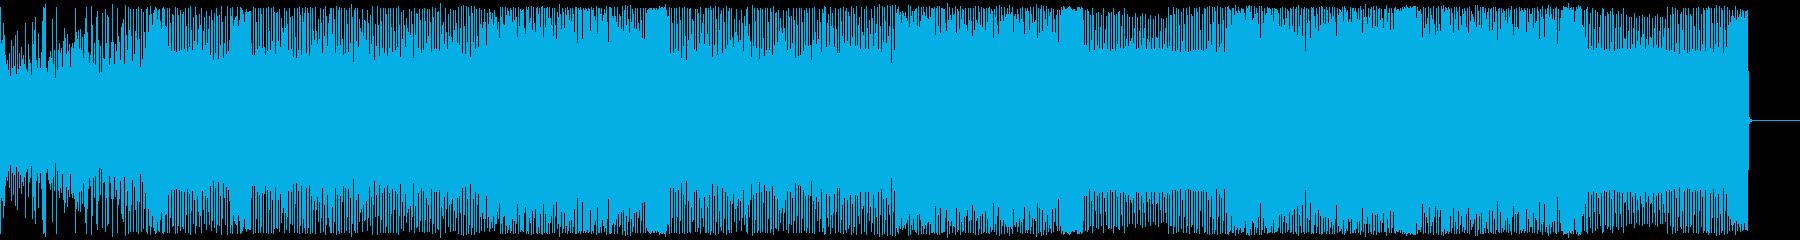 House/EDM/ダンス/DJ/クラブの再生済みの波形